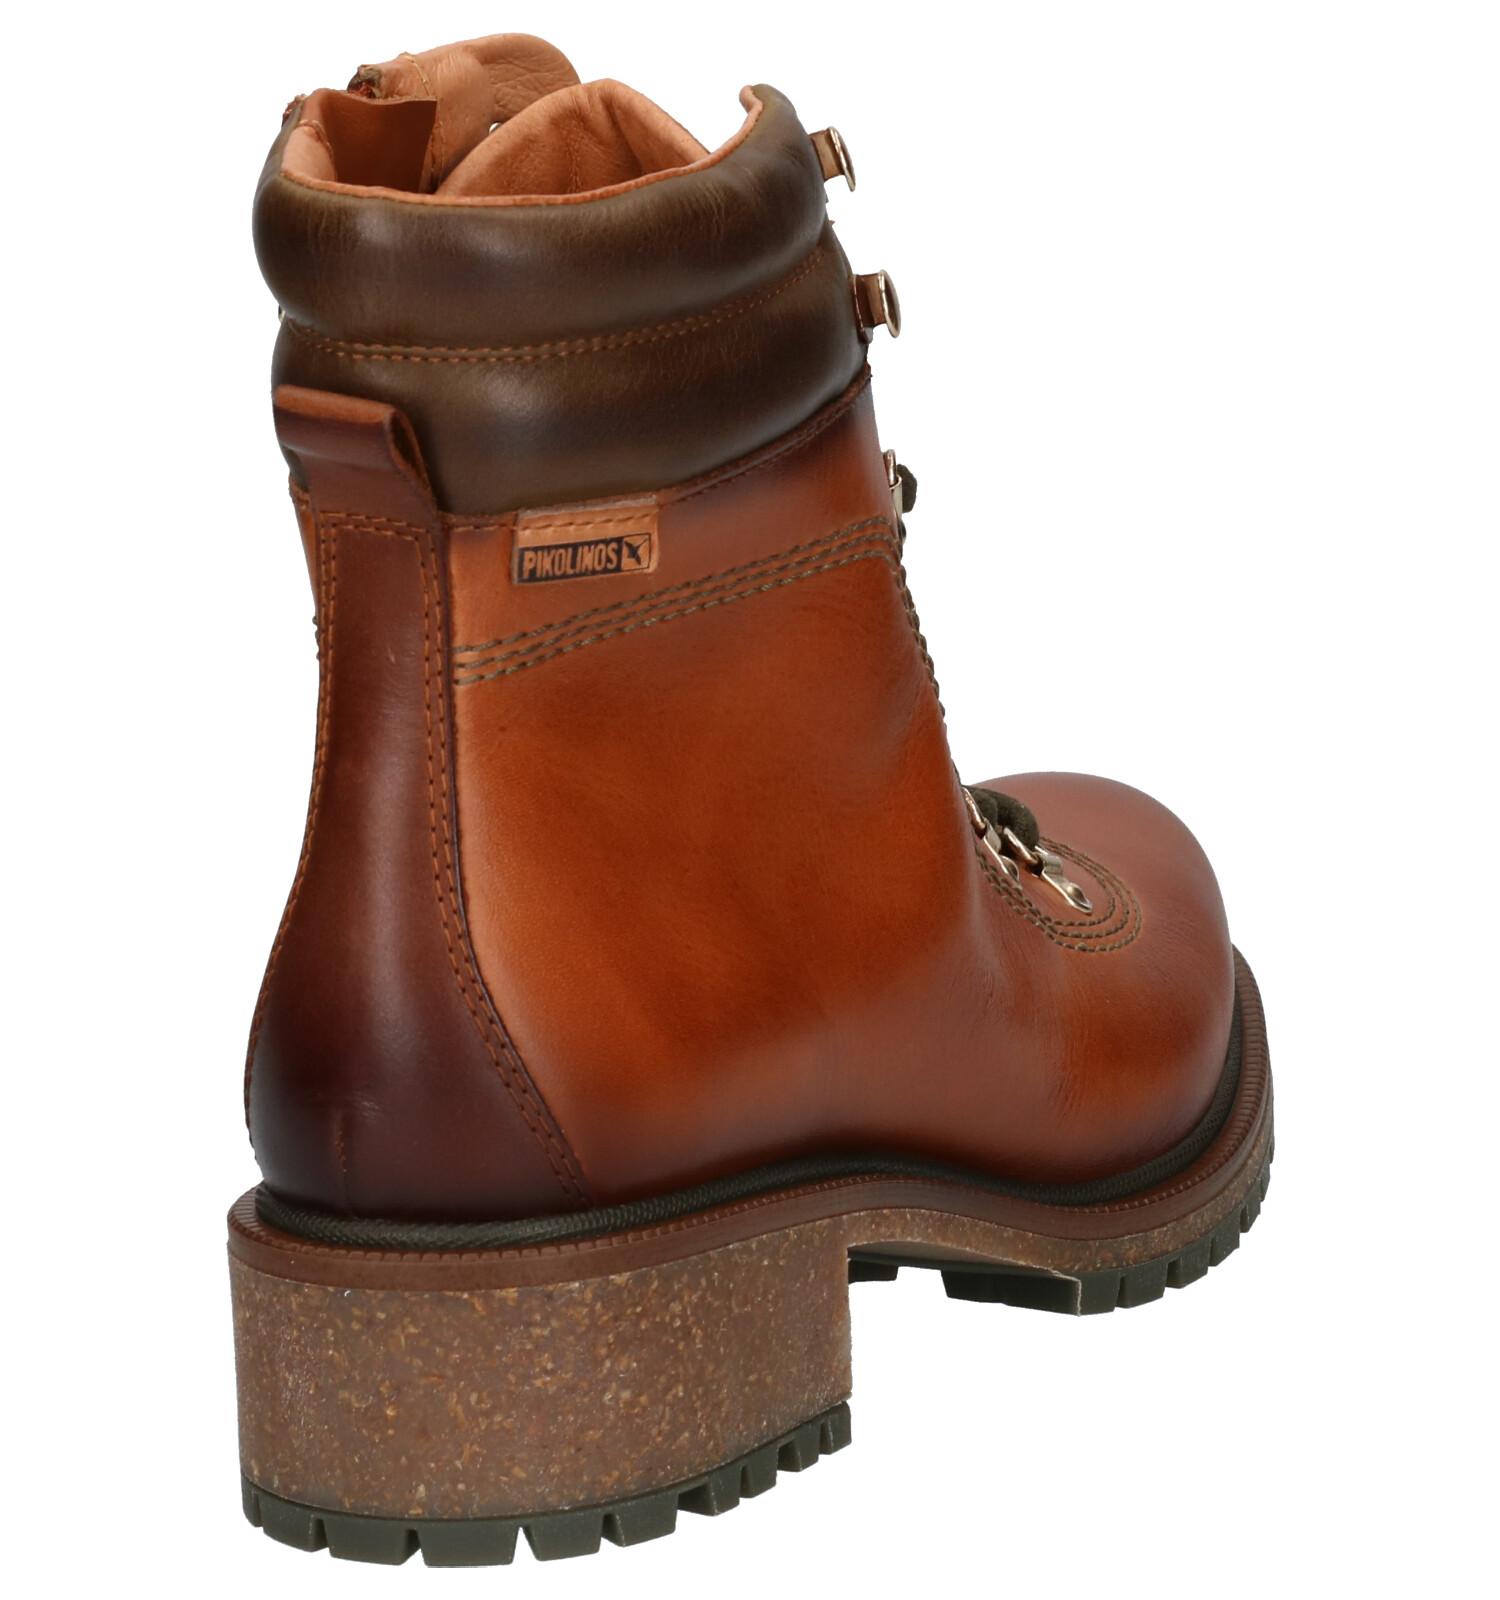 Aspe Aspe Boots Cognac Pikolinos Pikolinos Cognac qUpSMVz